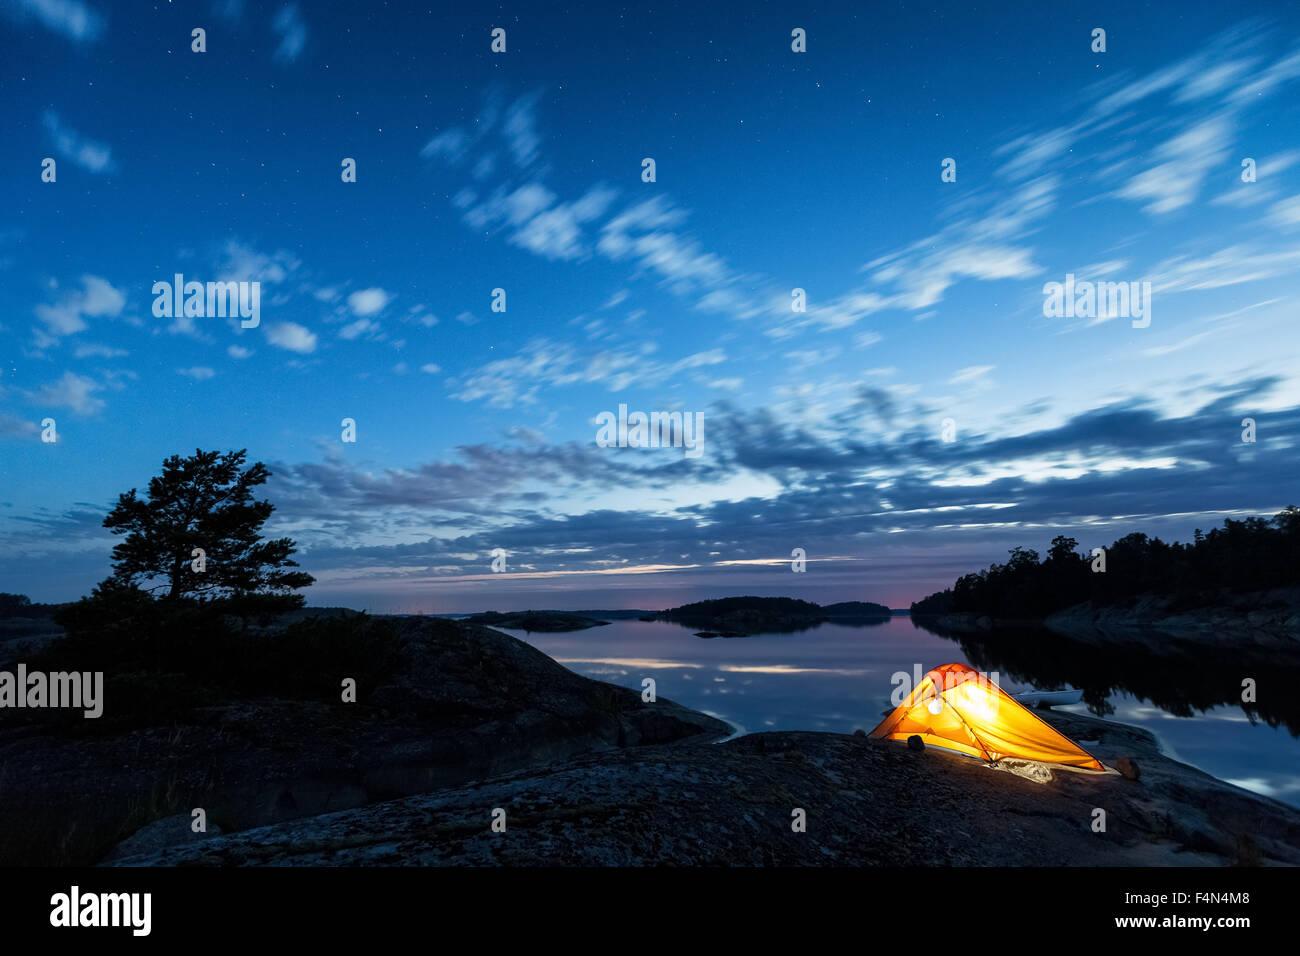 Campeggio a Tammisaari arcipelago, Tammisaari, Finlandia, Europa, UE Immagini Stock